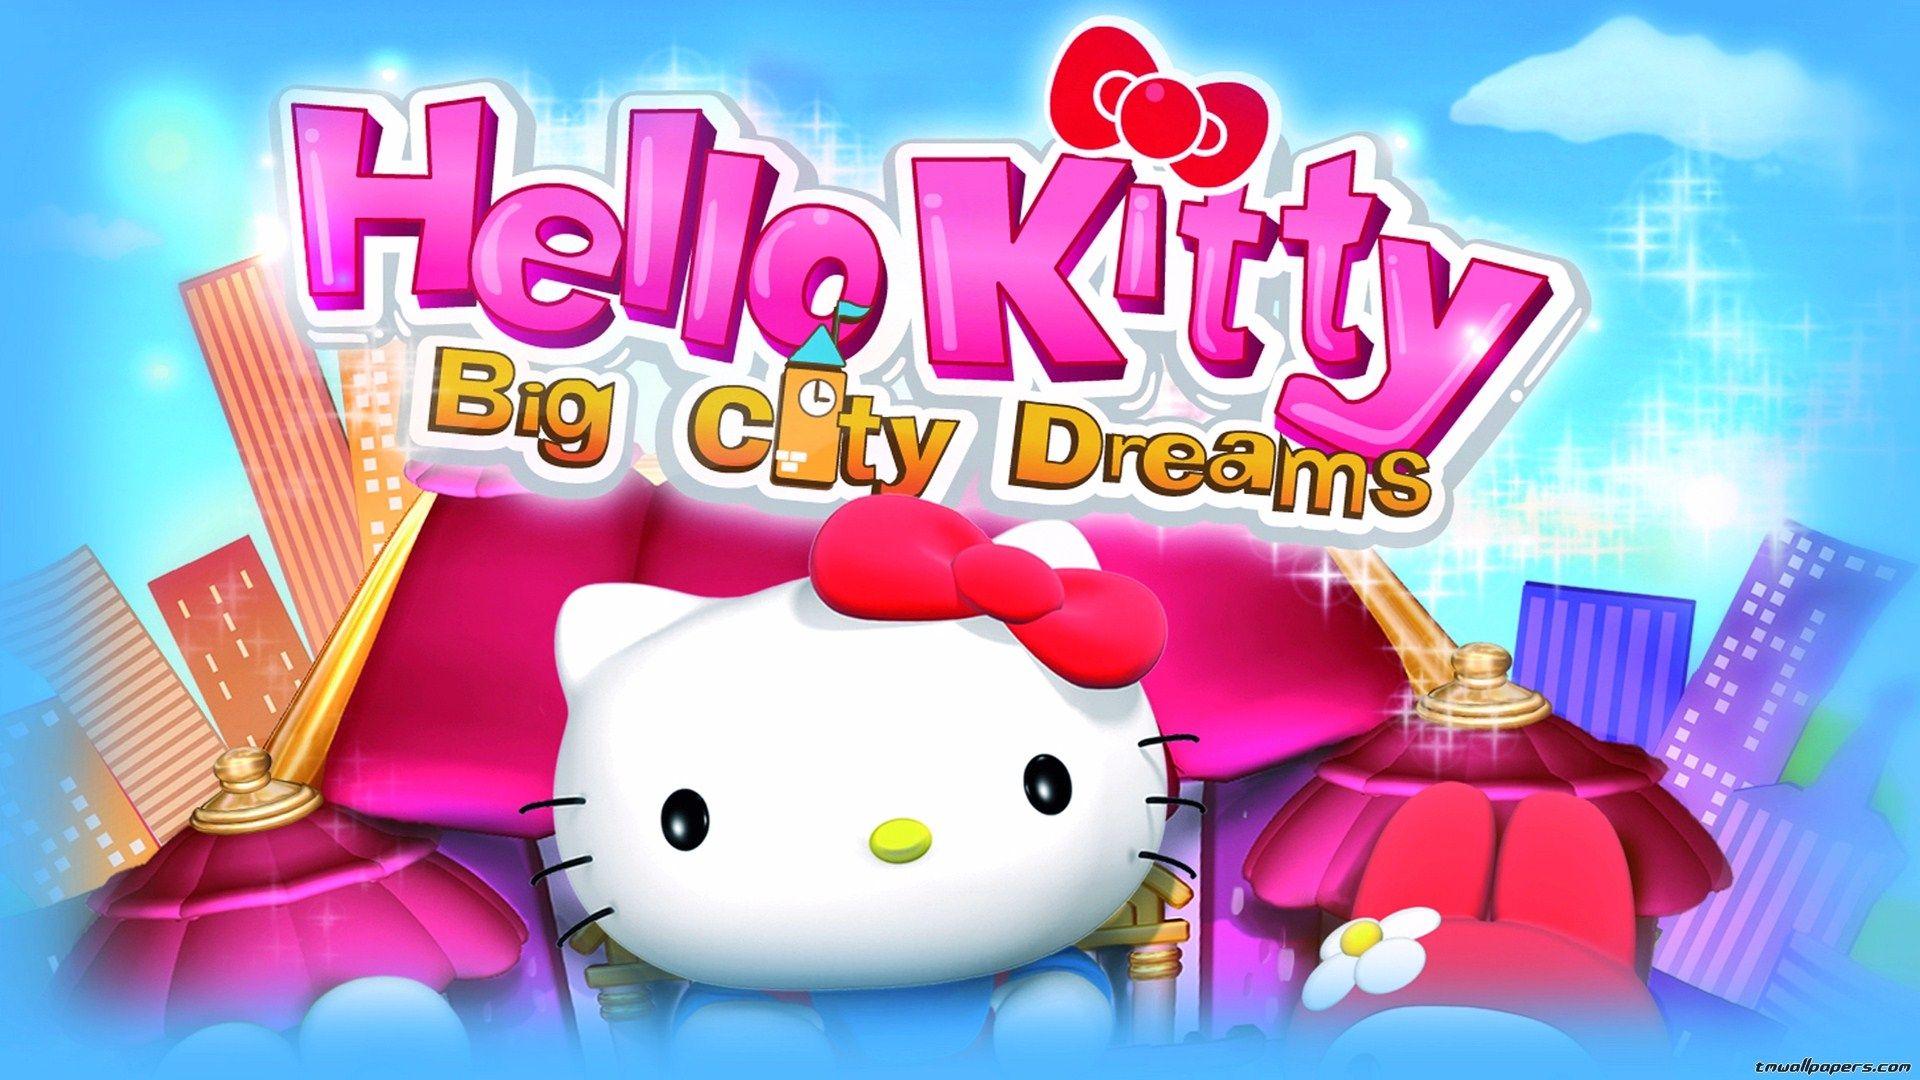 Hello kitty images hello kitty hd wallpaper and background - Hello Kitty Hd Wallpapers Backgrounds Wallpaper 1025 768 Hello Kitty Wallpapers Hd 43 Wallpapers